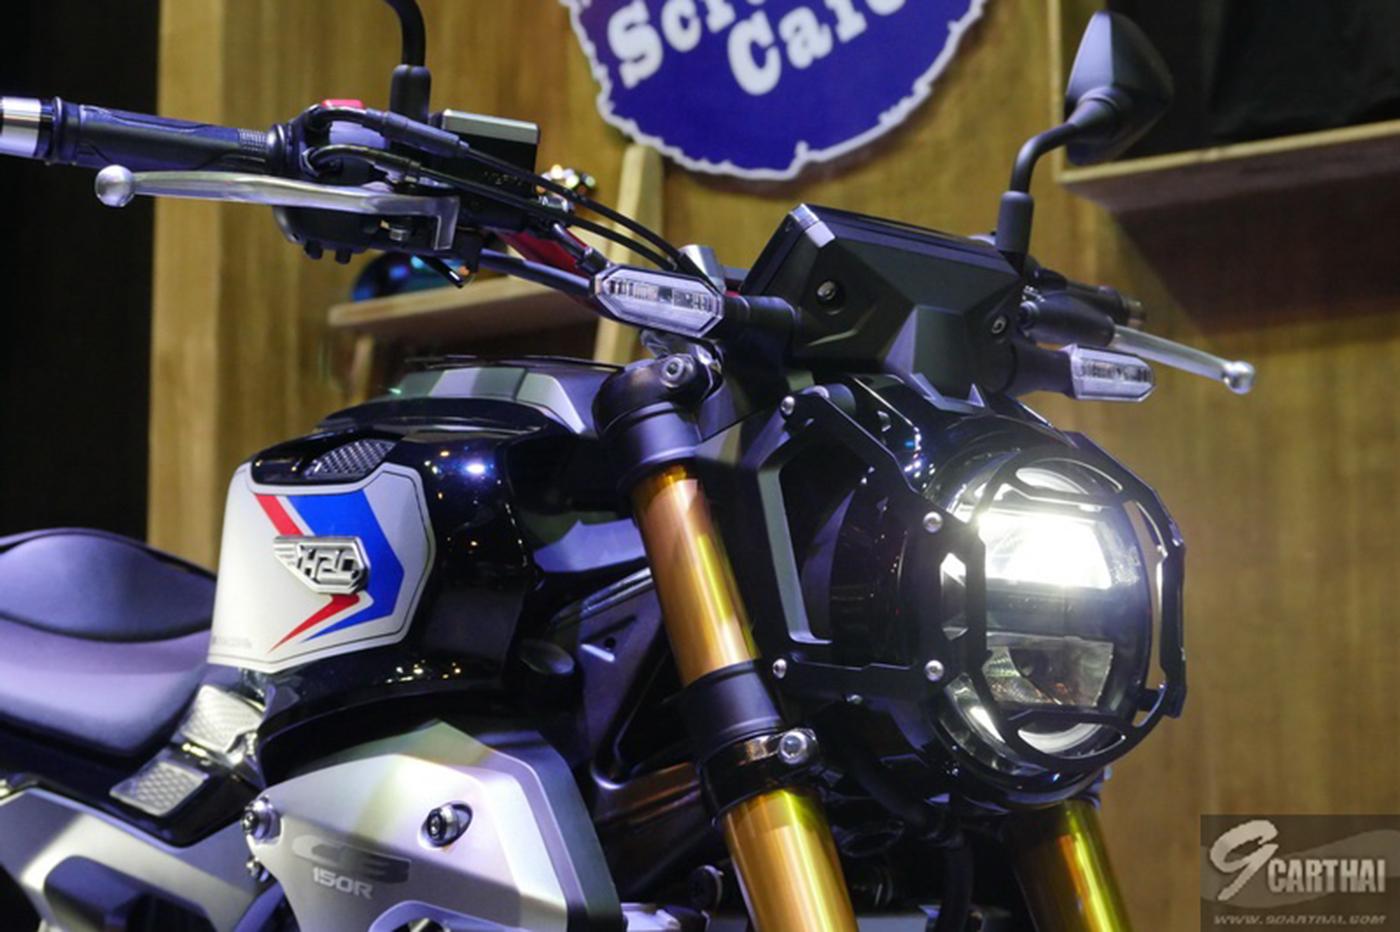 honda-cb150r-world-premiere-36.jpg